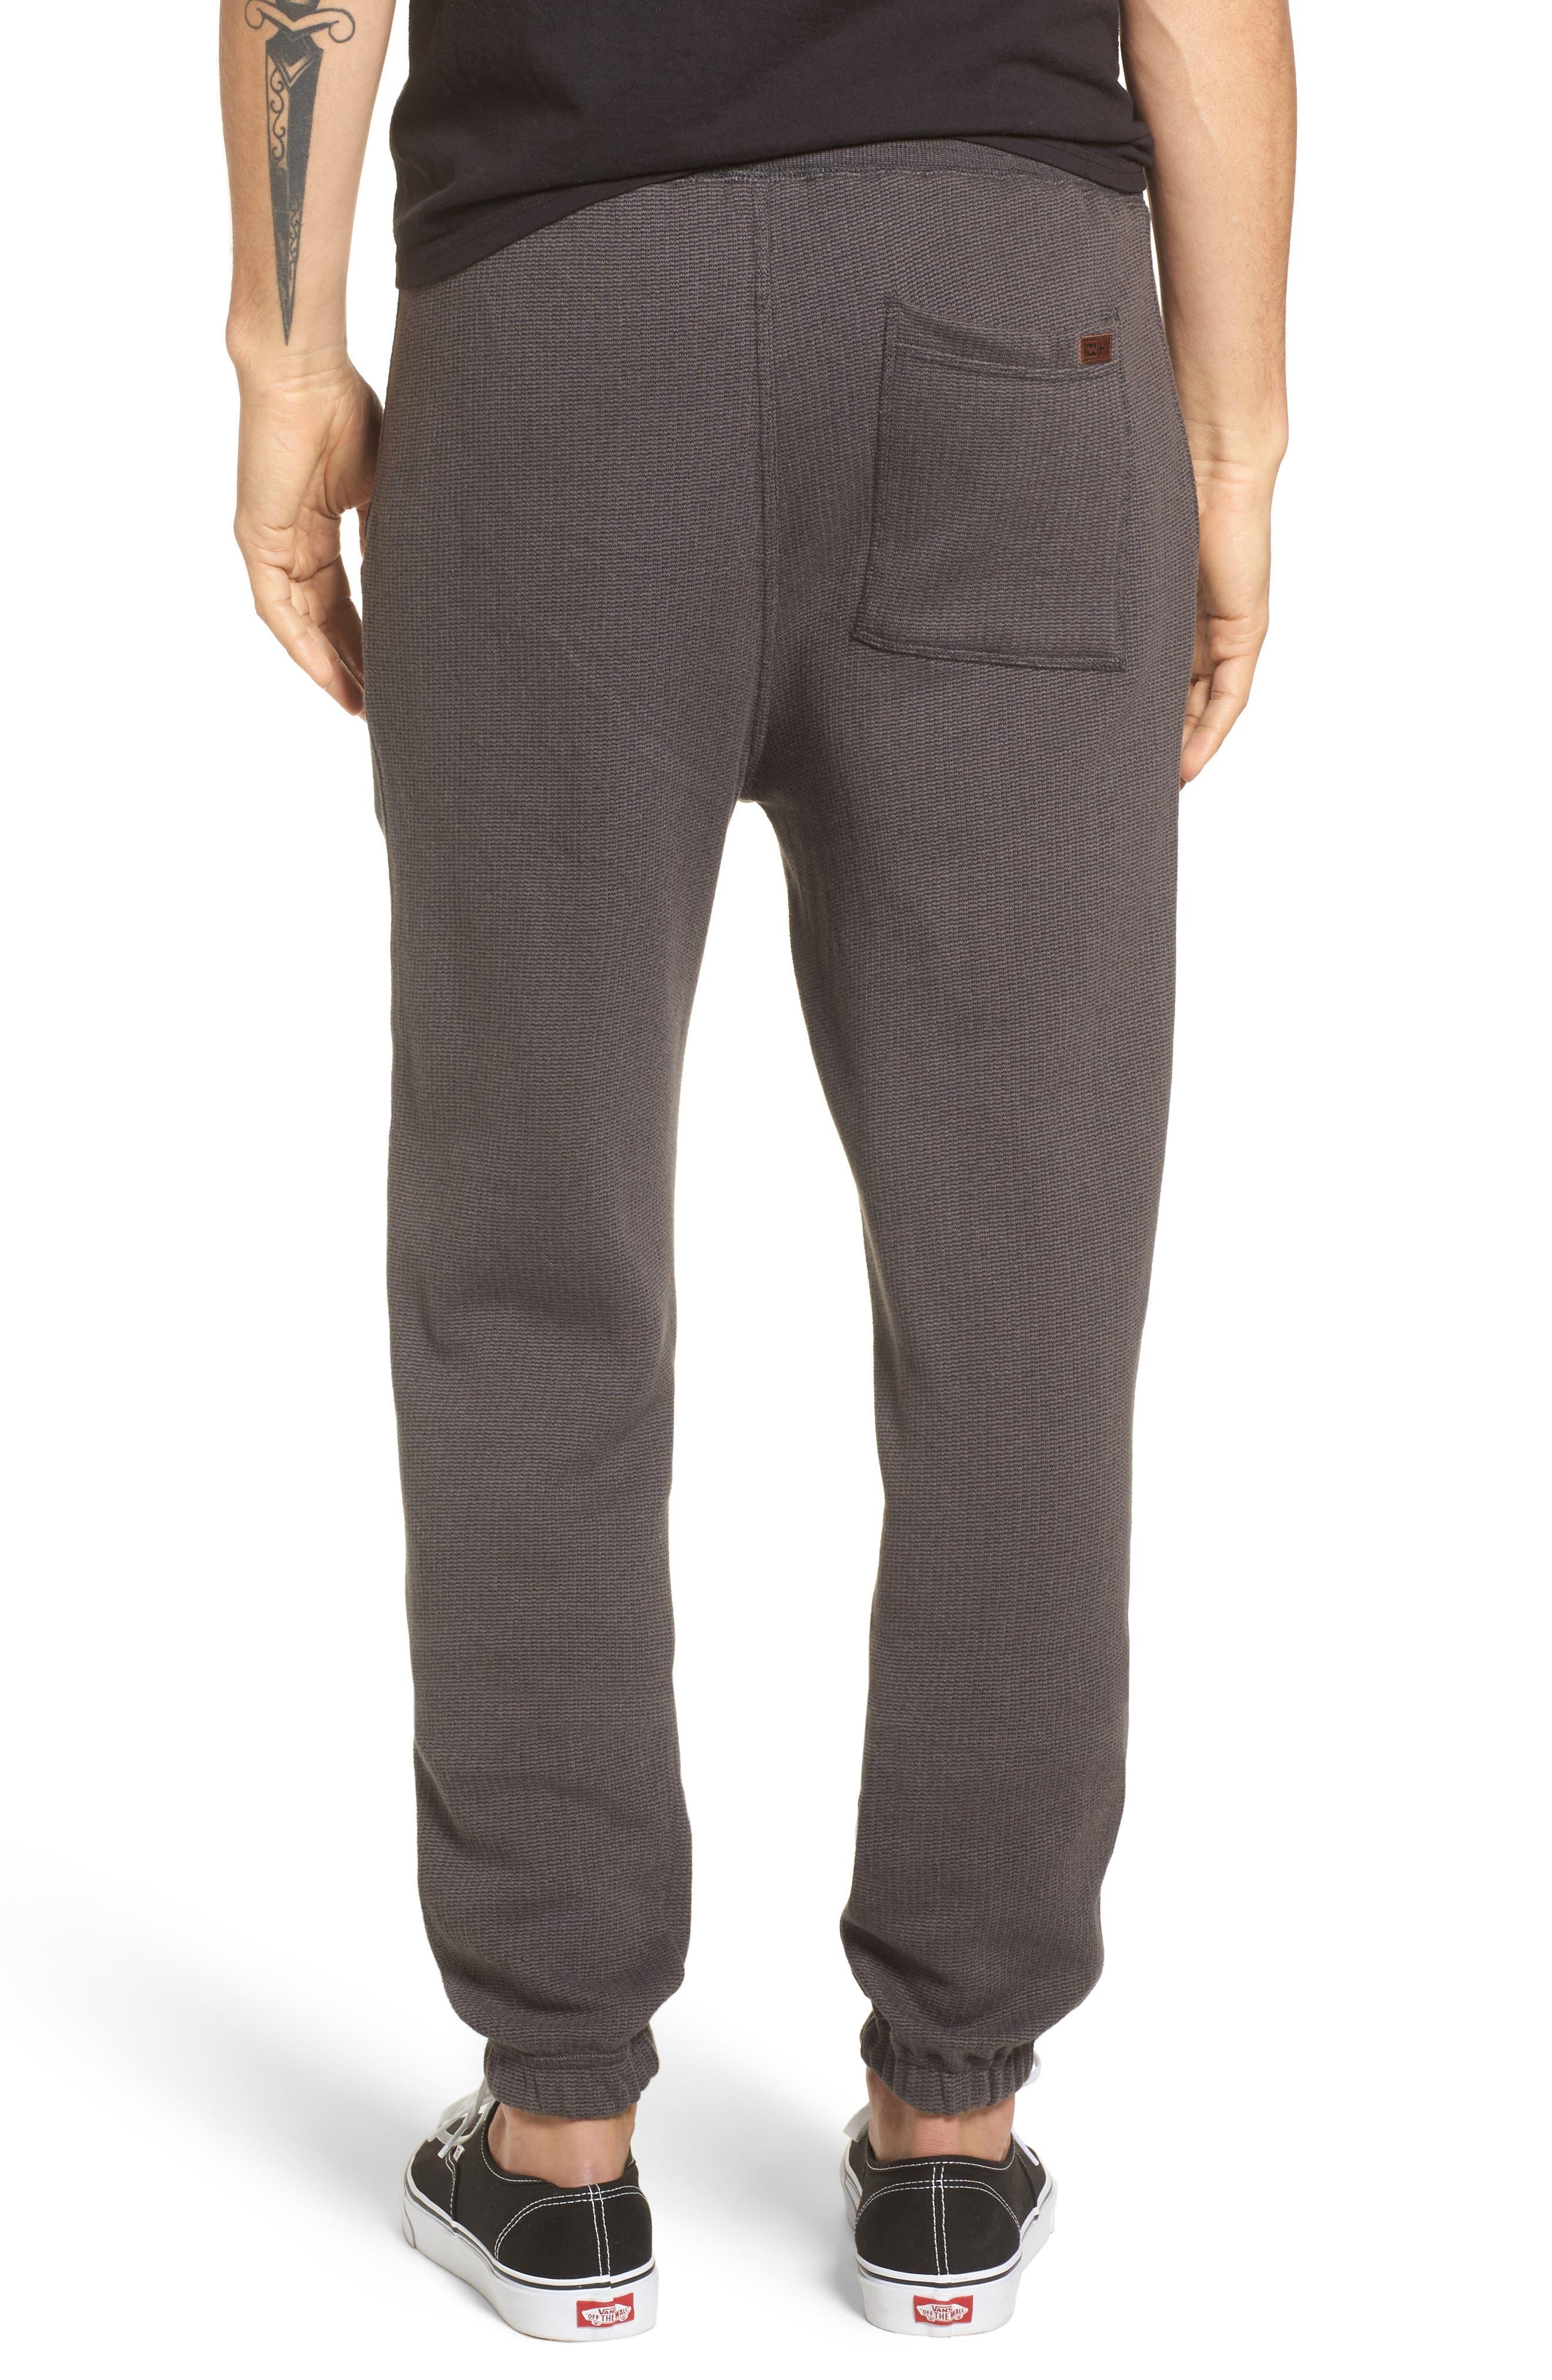 Hudson Sweatpants,                             Alternate thumbnail 2, color,                             001